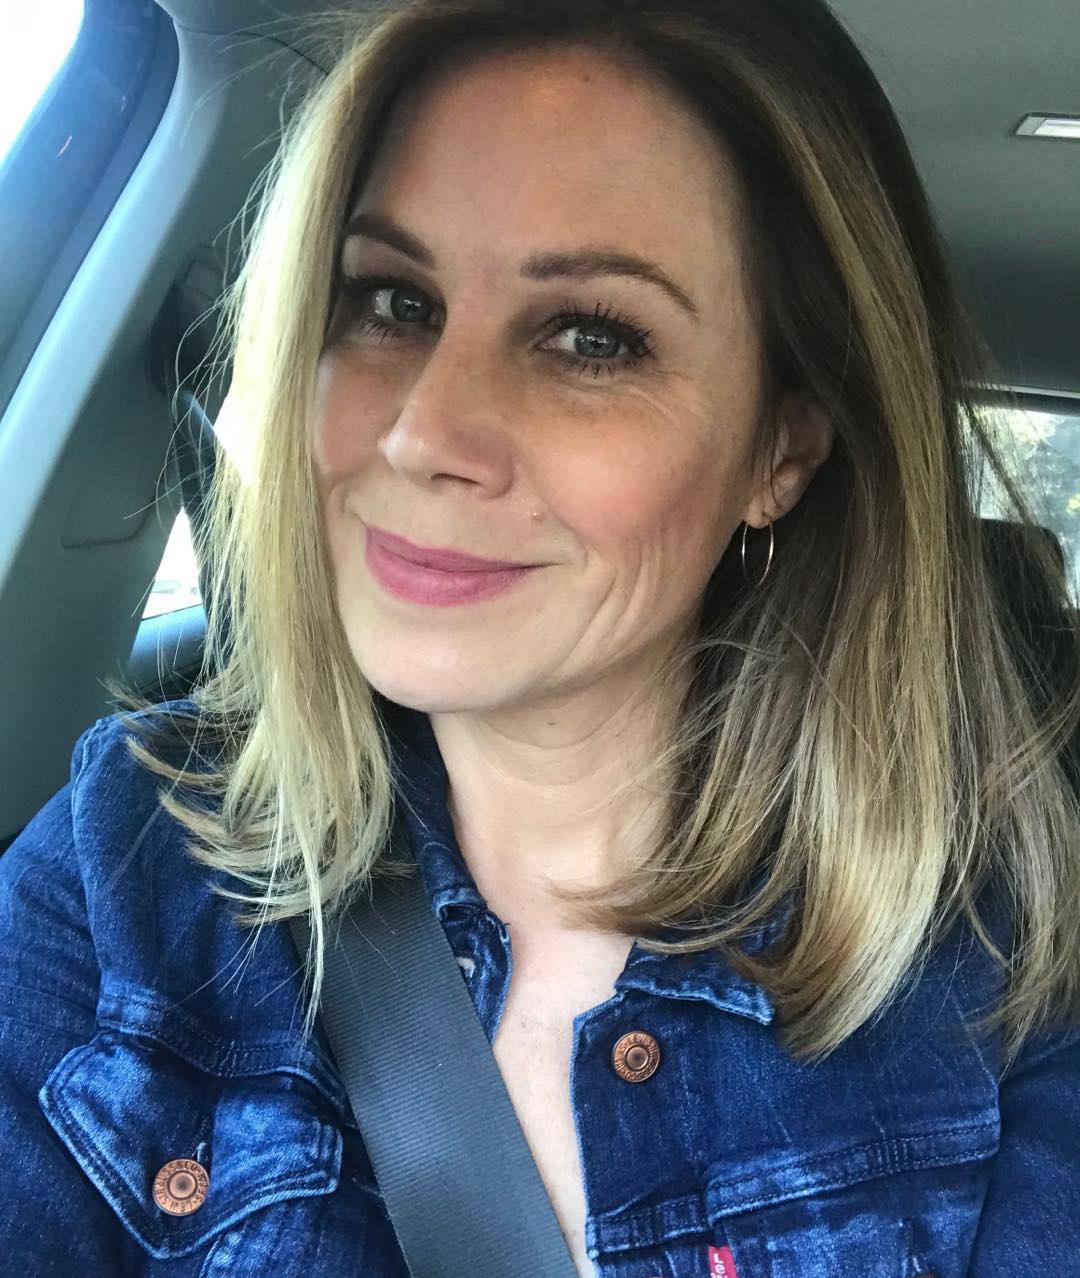 Jane Hall in Instagram Selfie